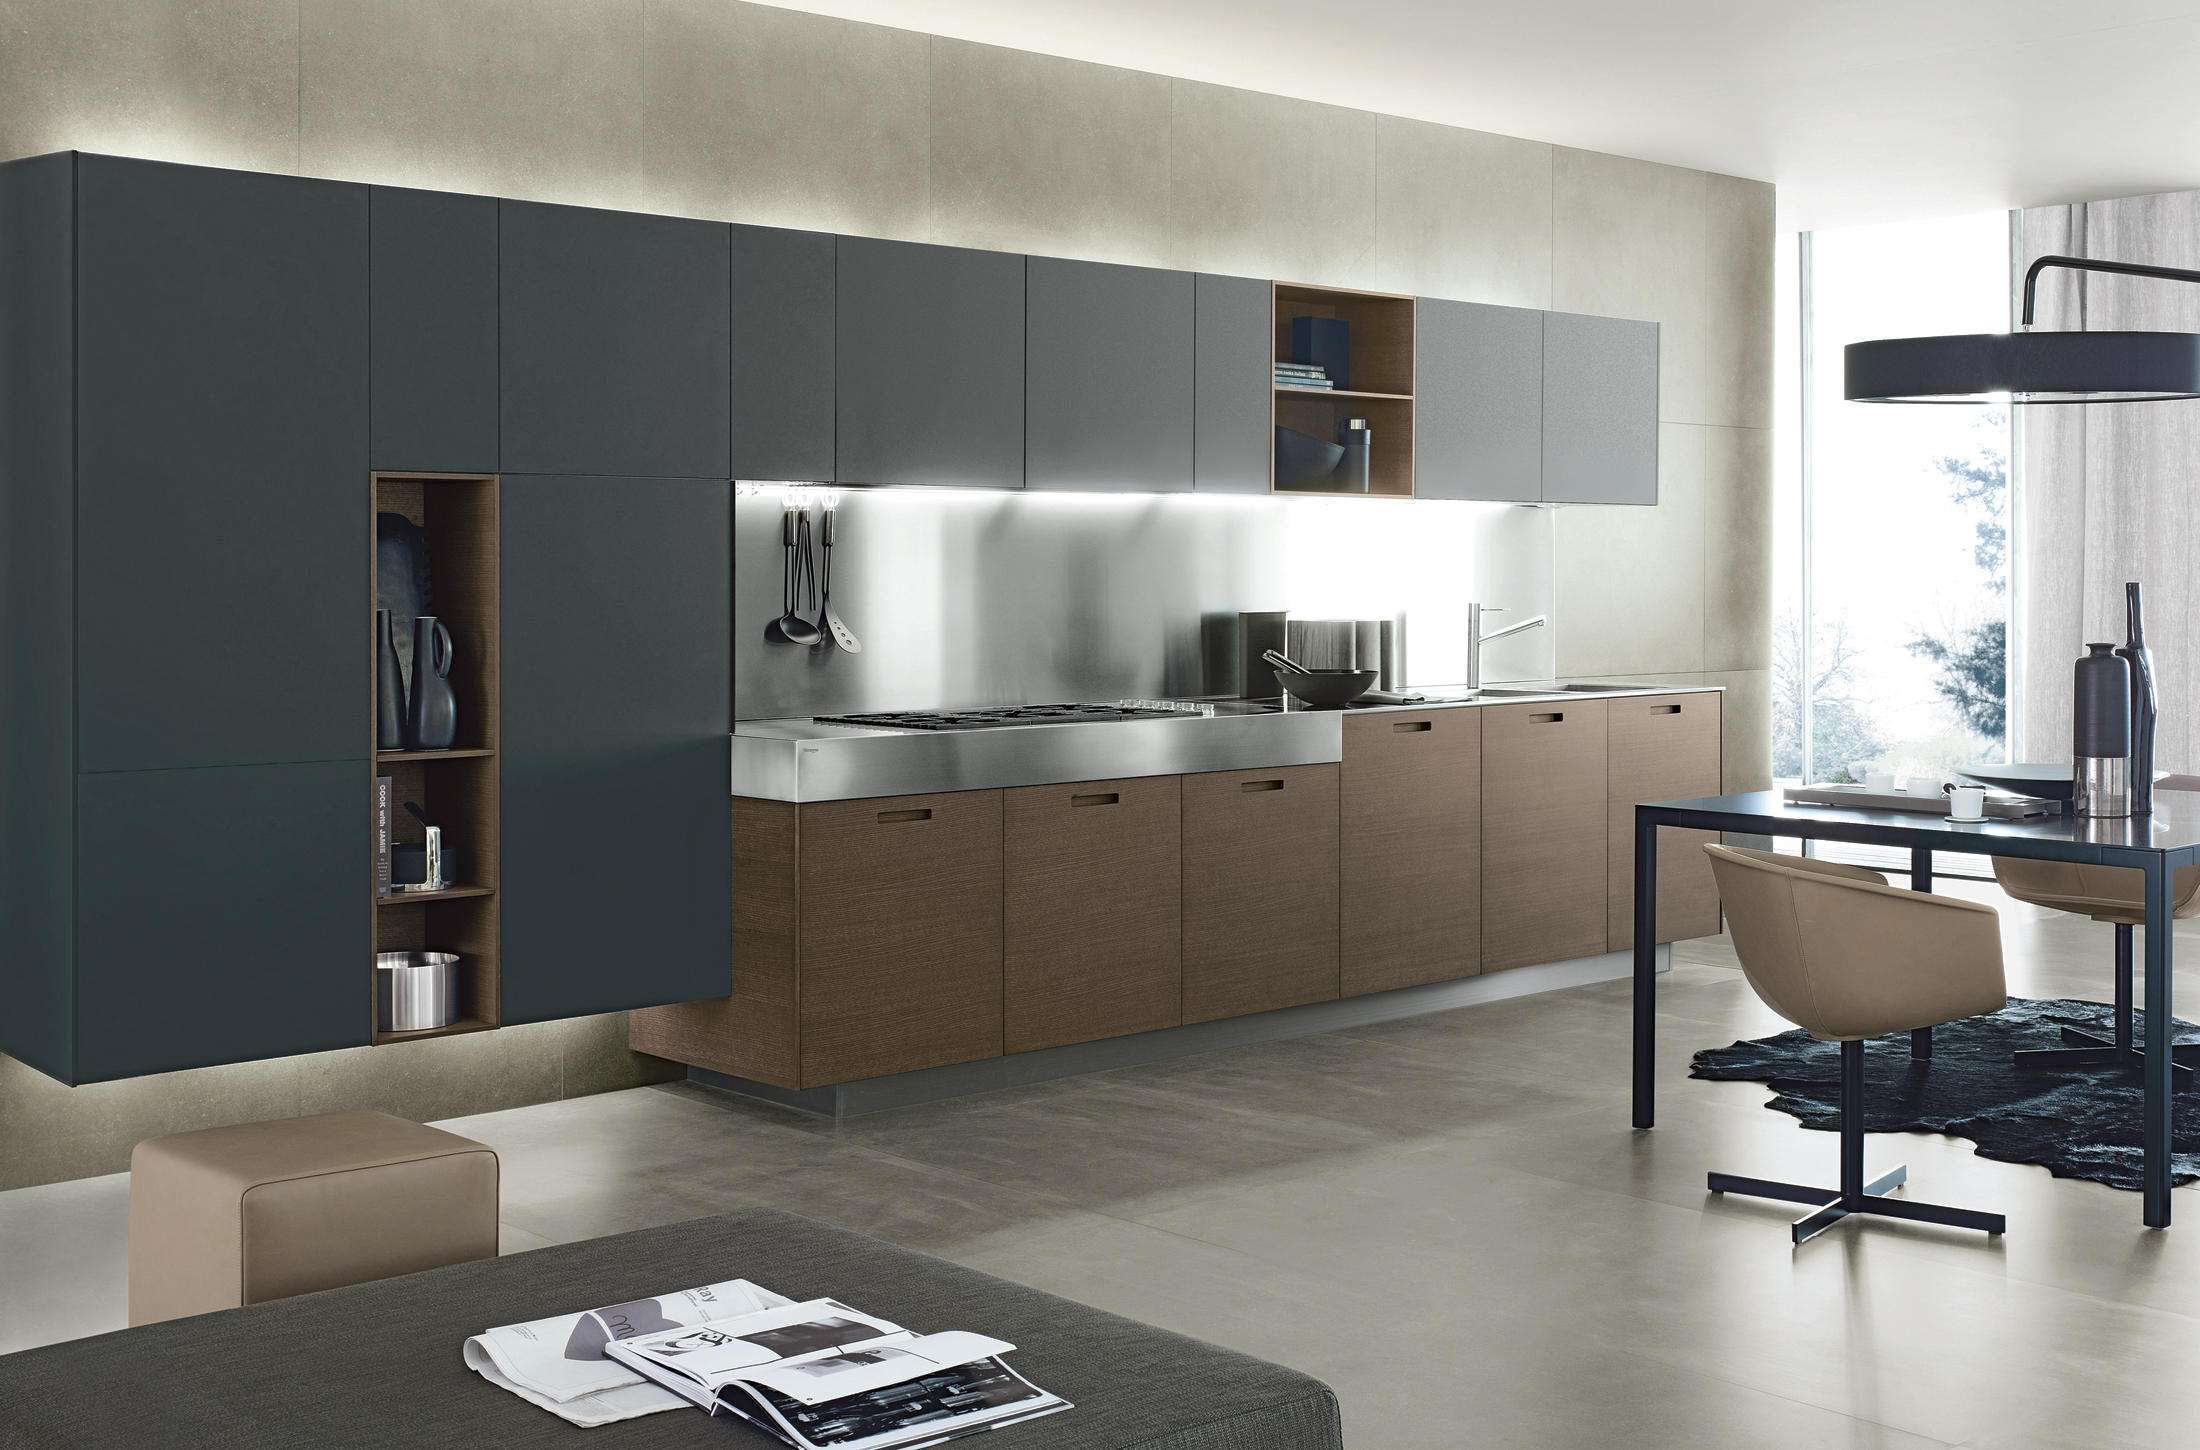 Kyton By Varenna Poliform | Fitted Kitchens